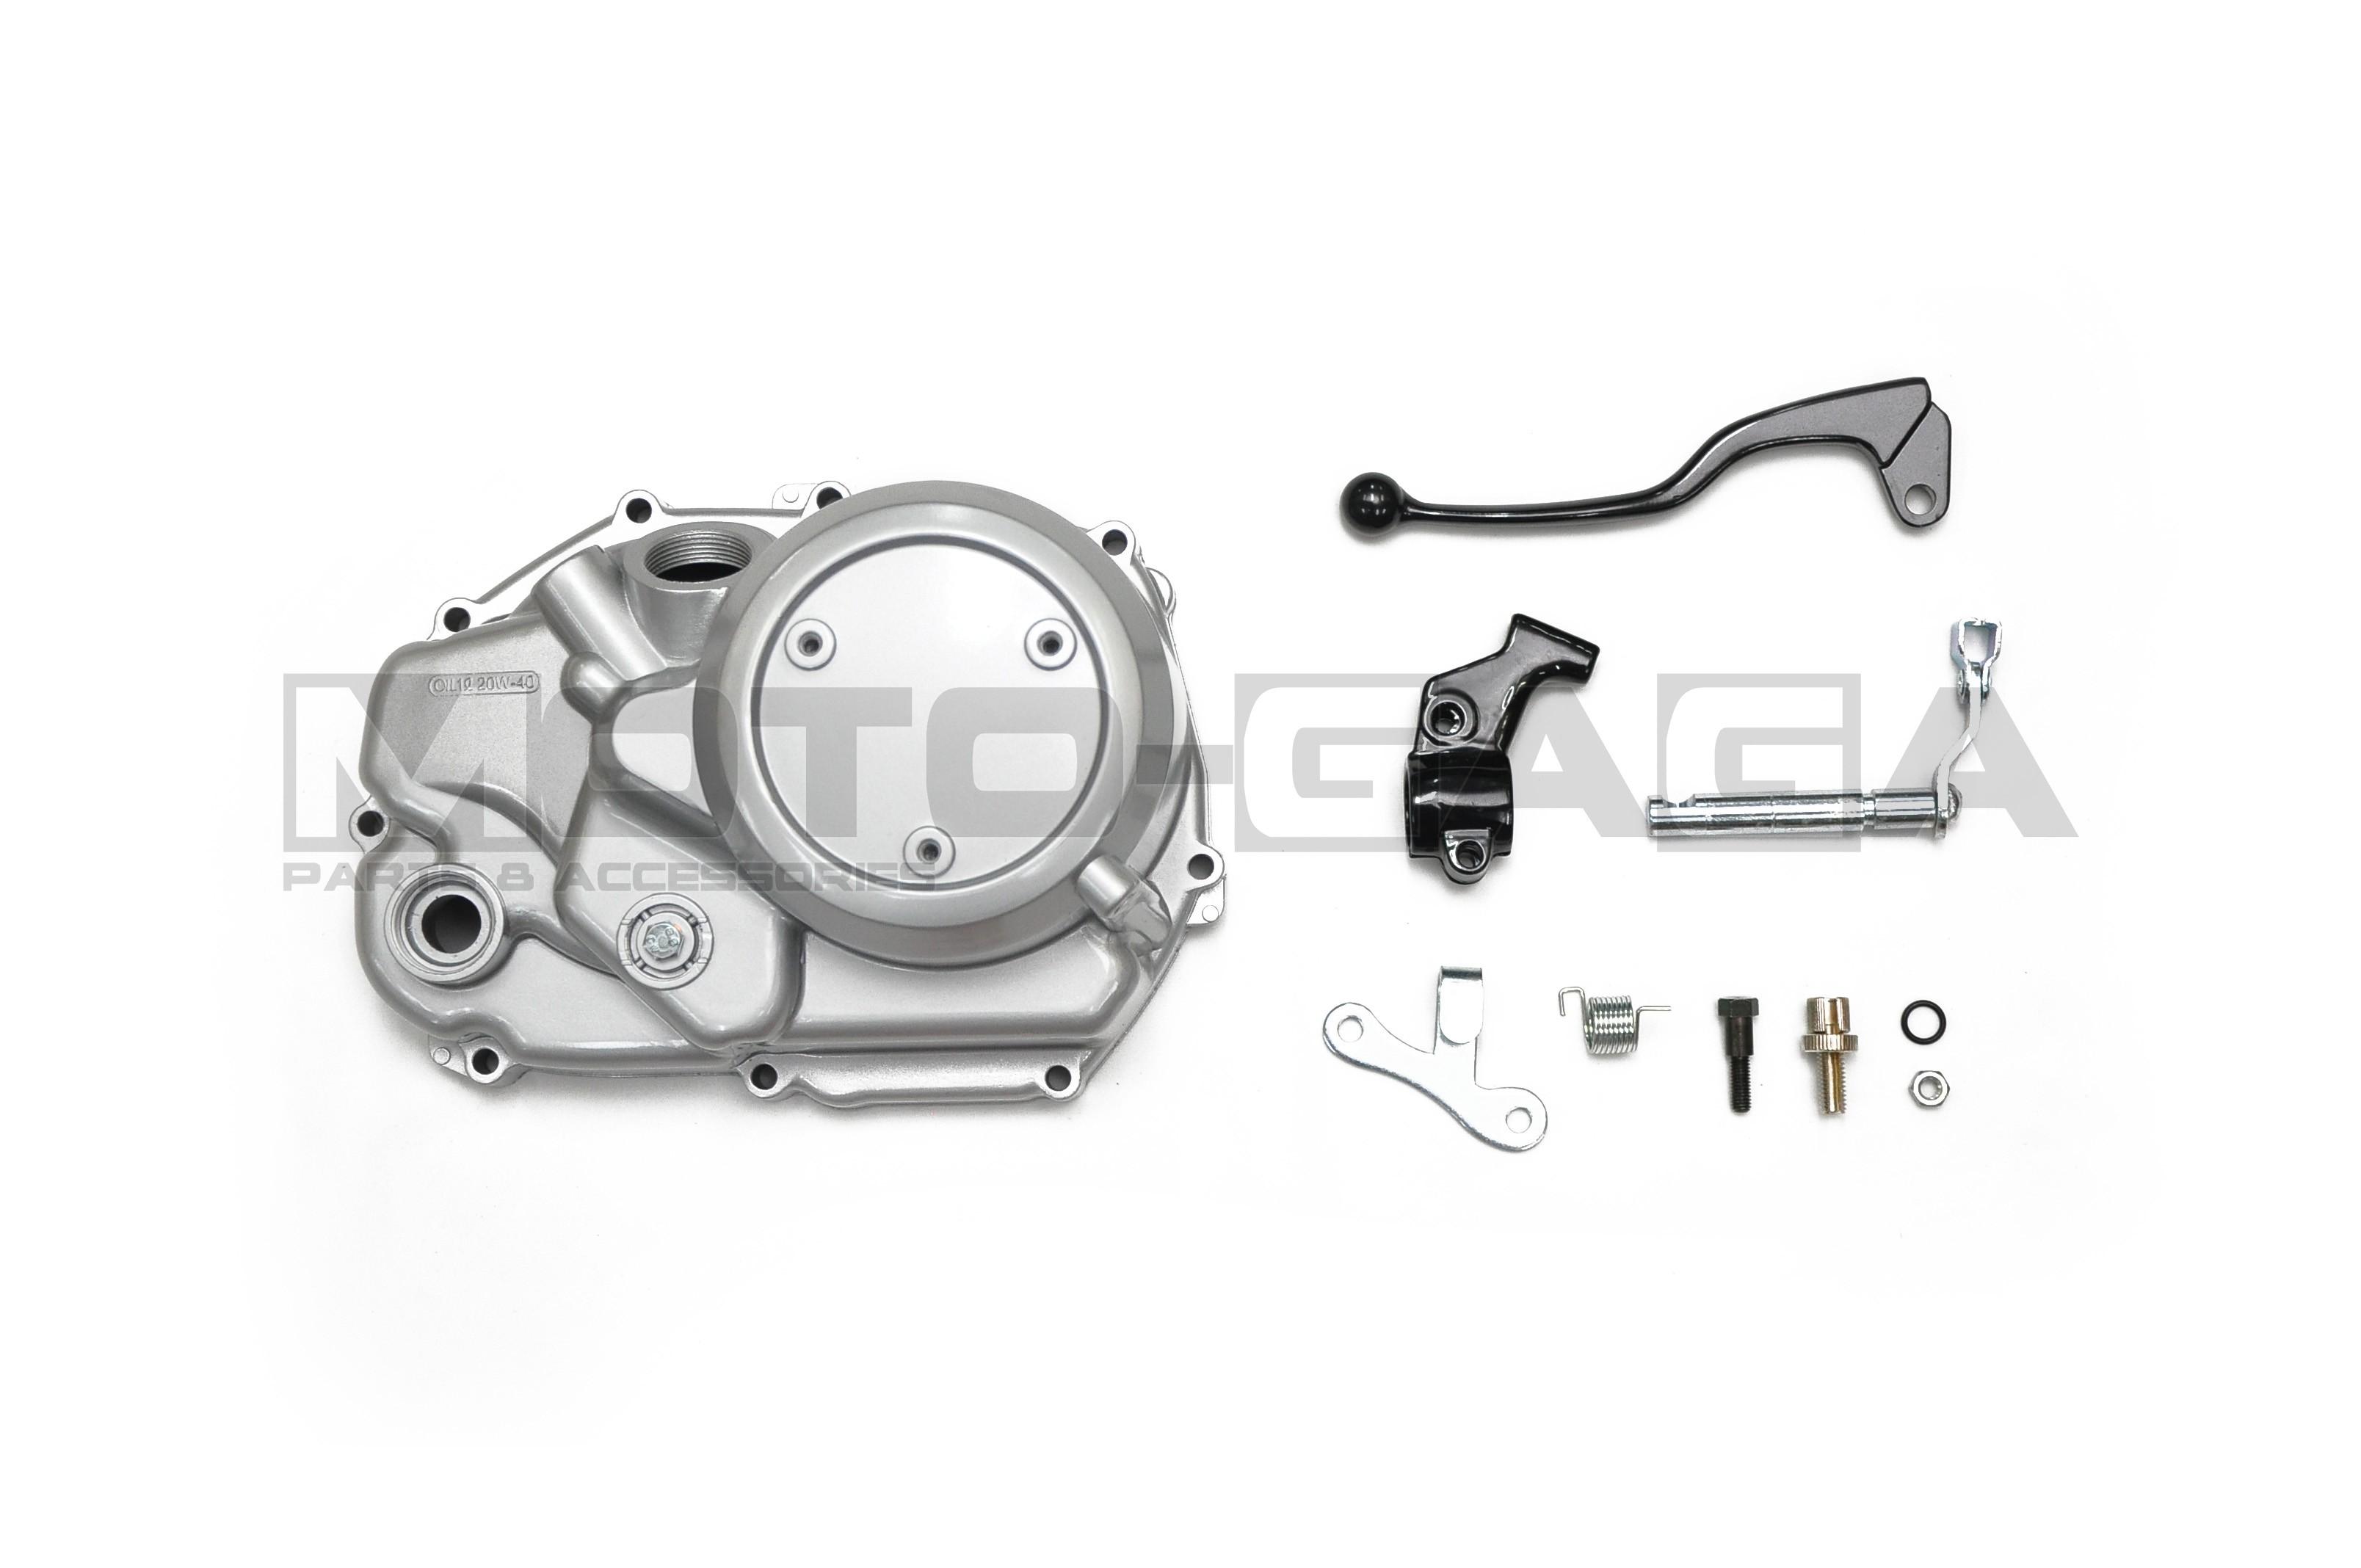 2000 Honda Ct110 Wiring Diagram Honda Fit Wiring